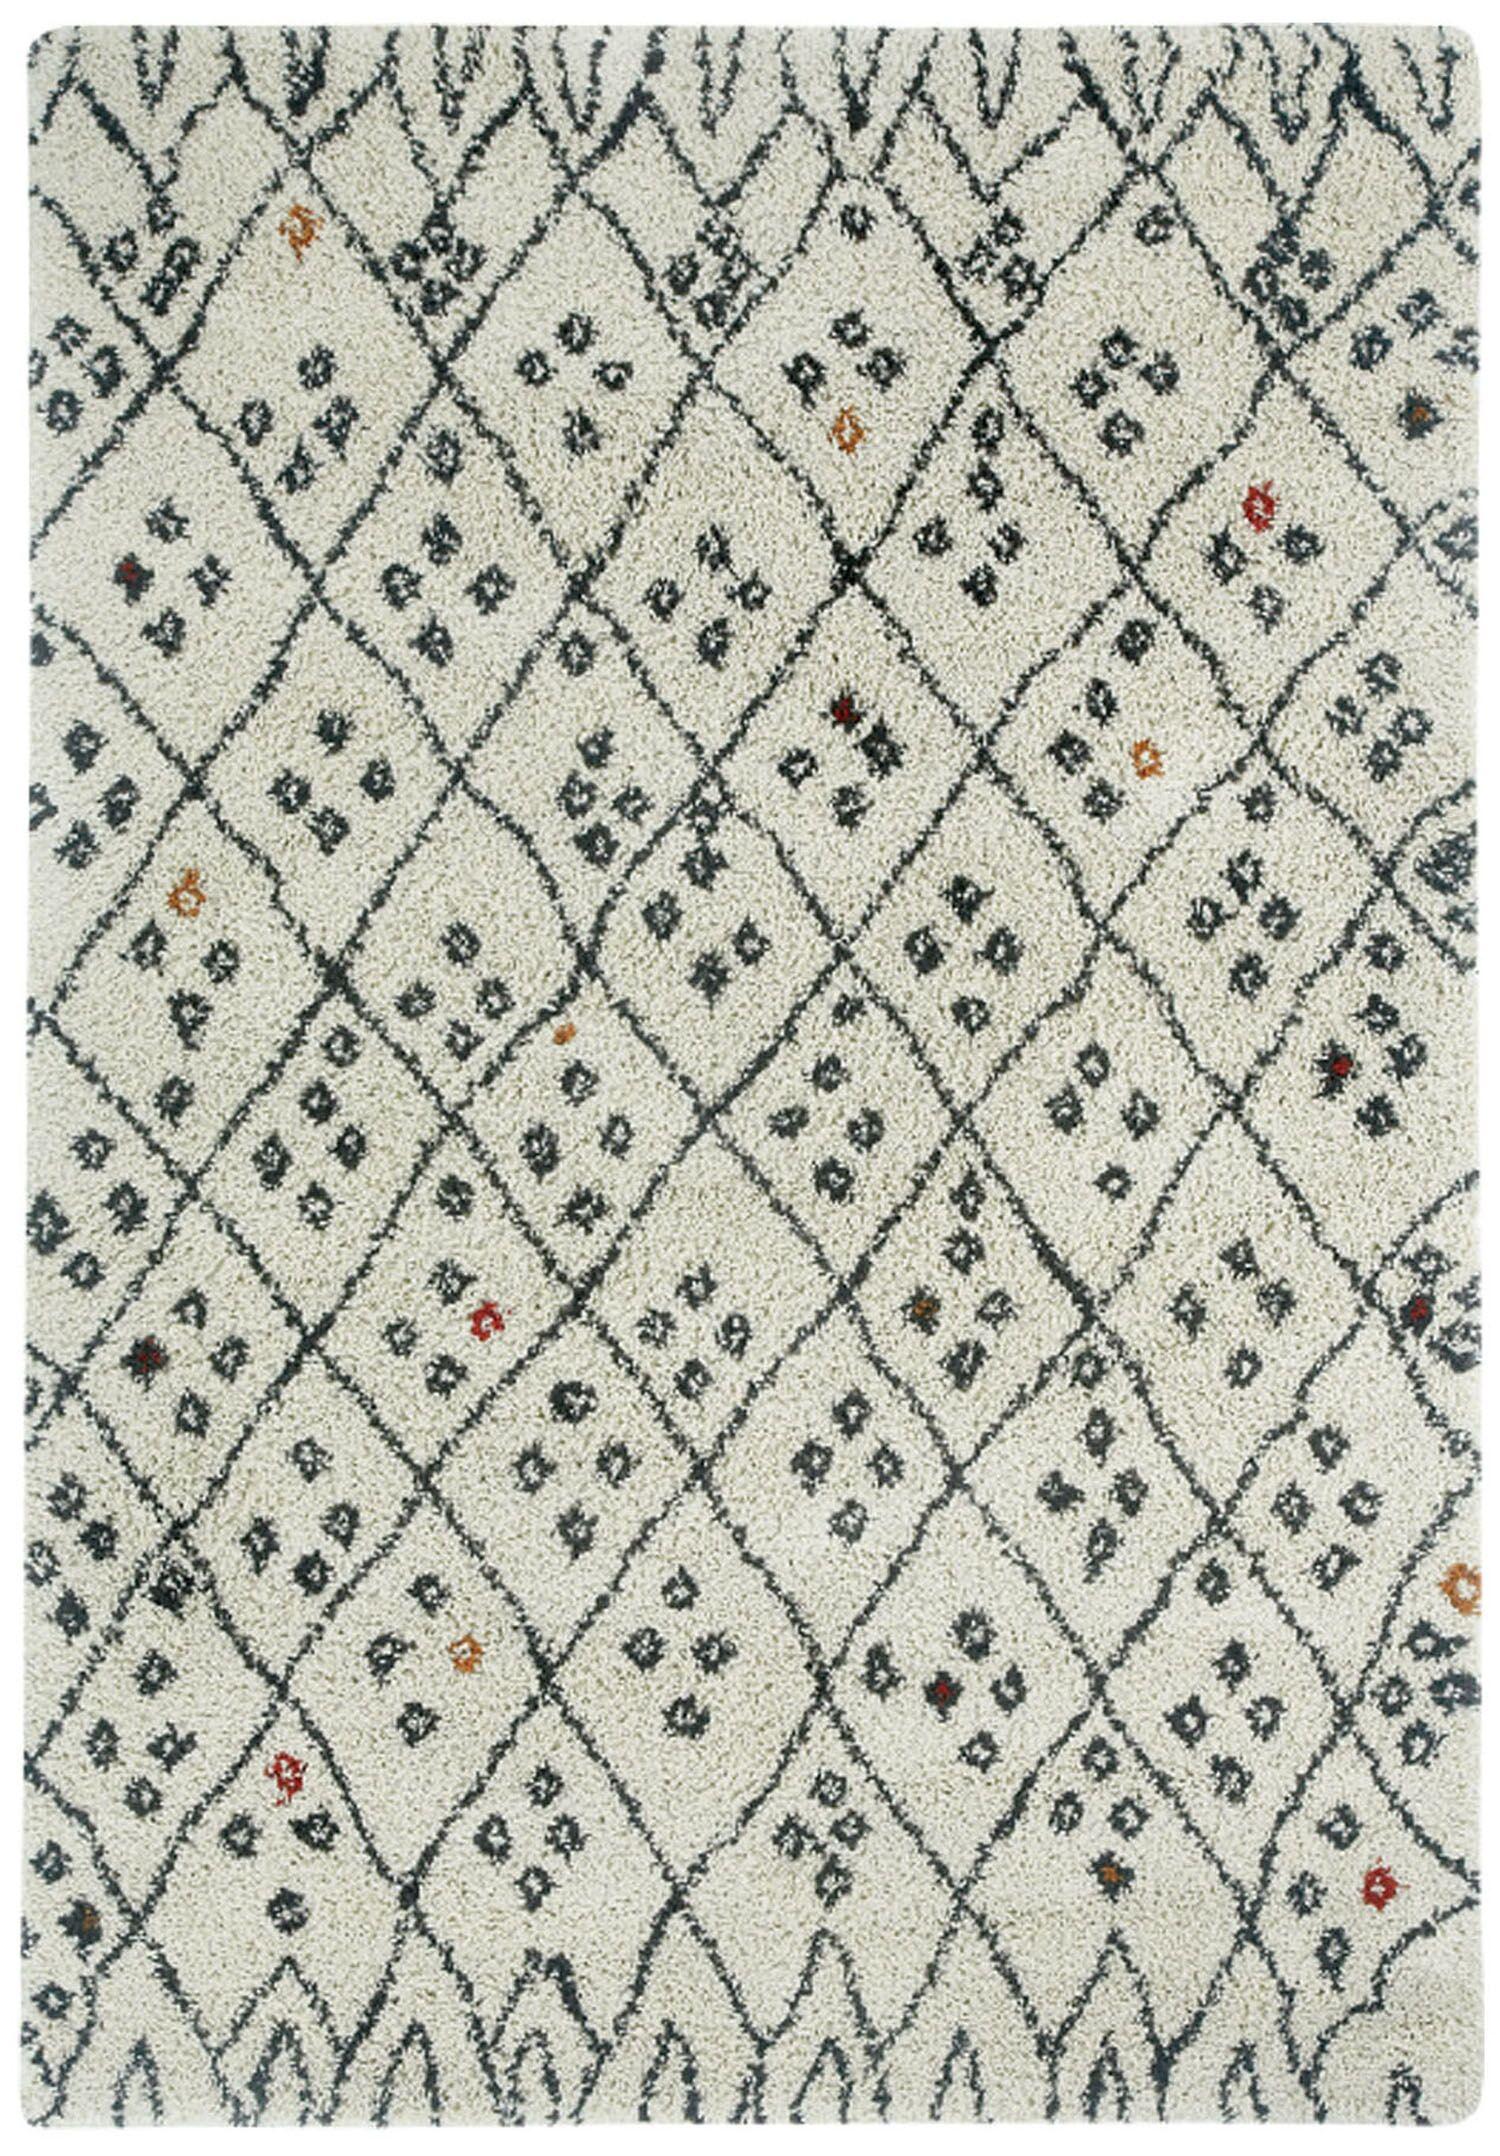 Woodward Cobblestone Black/Cream Area Rug Rug Size: Rectangle 3'11